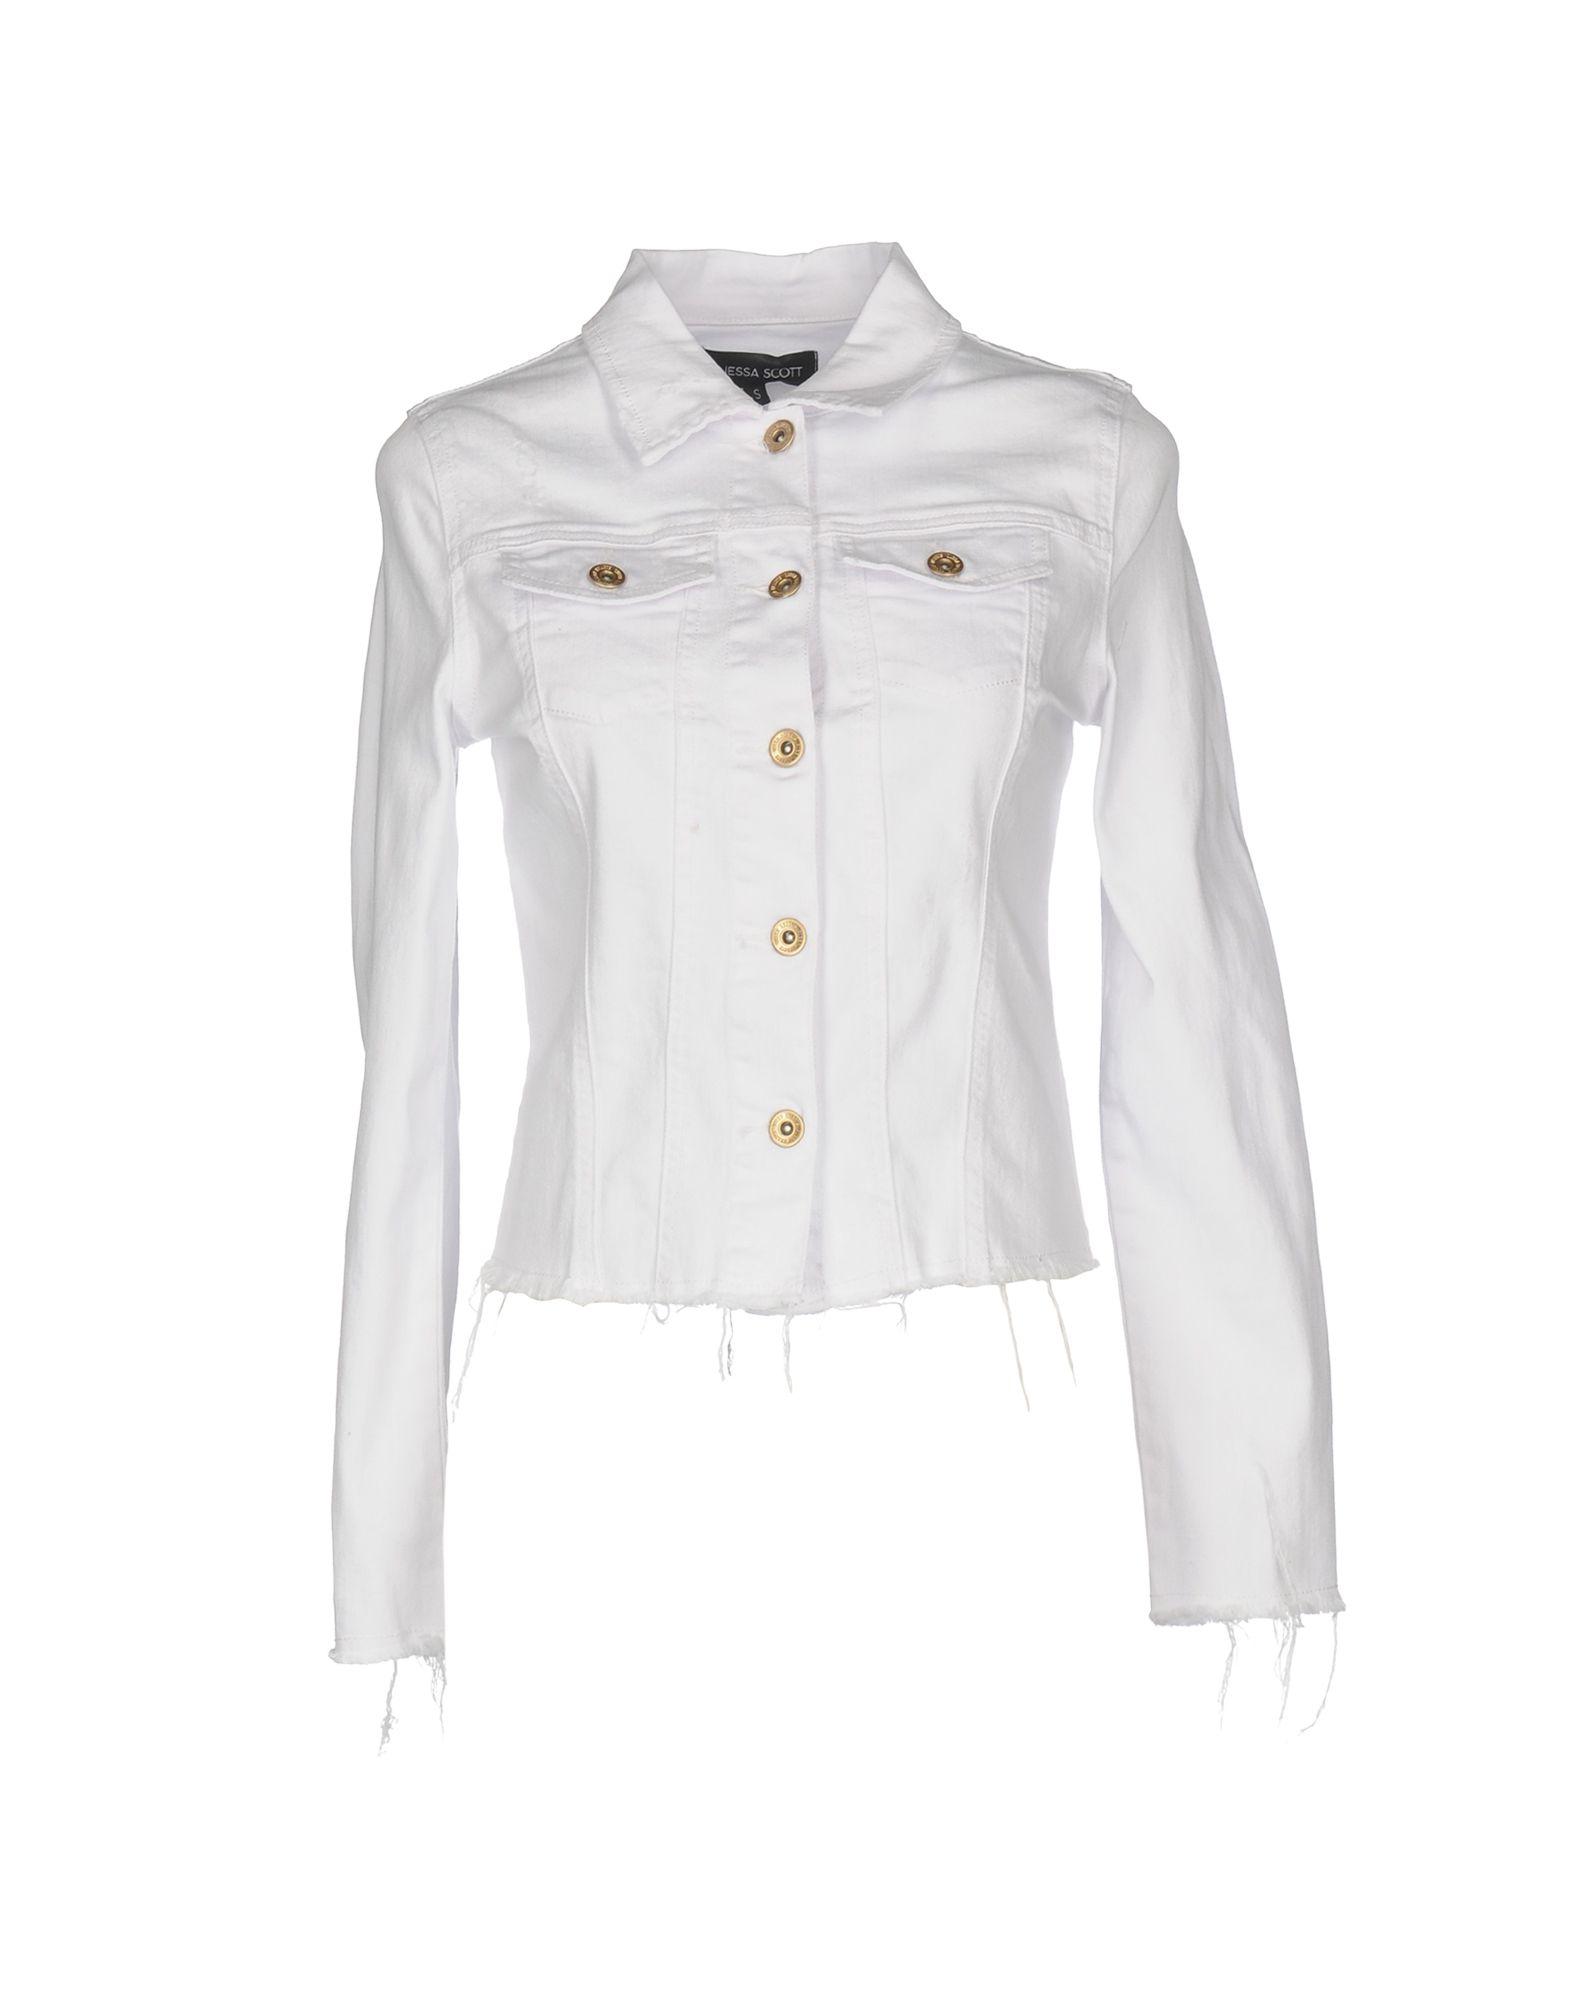 VANESSA SCOTT Джинсовая верхняя одежда верхняя одежда